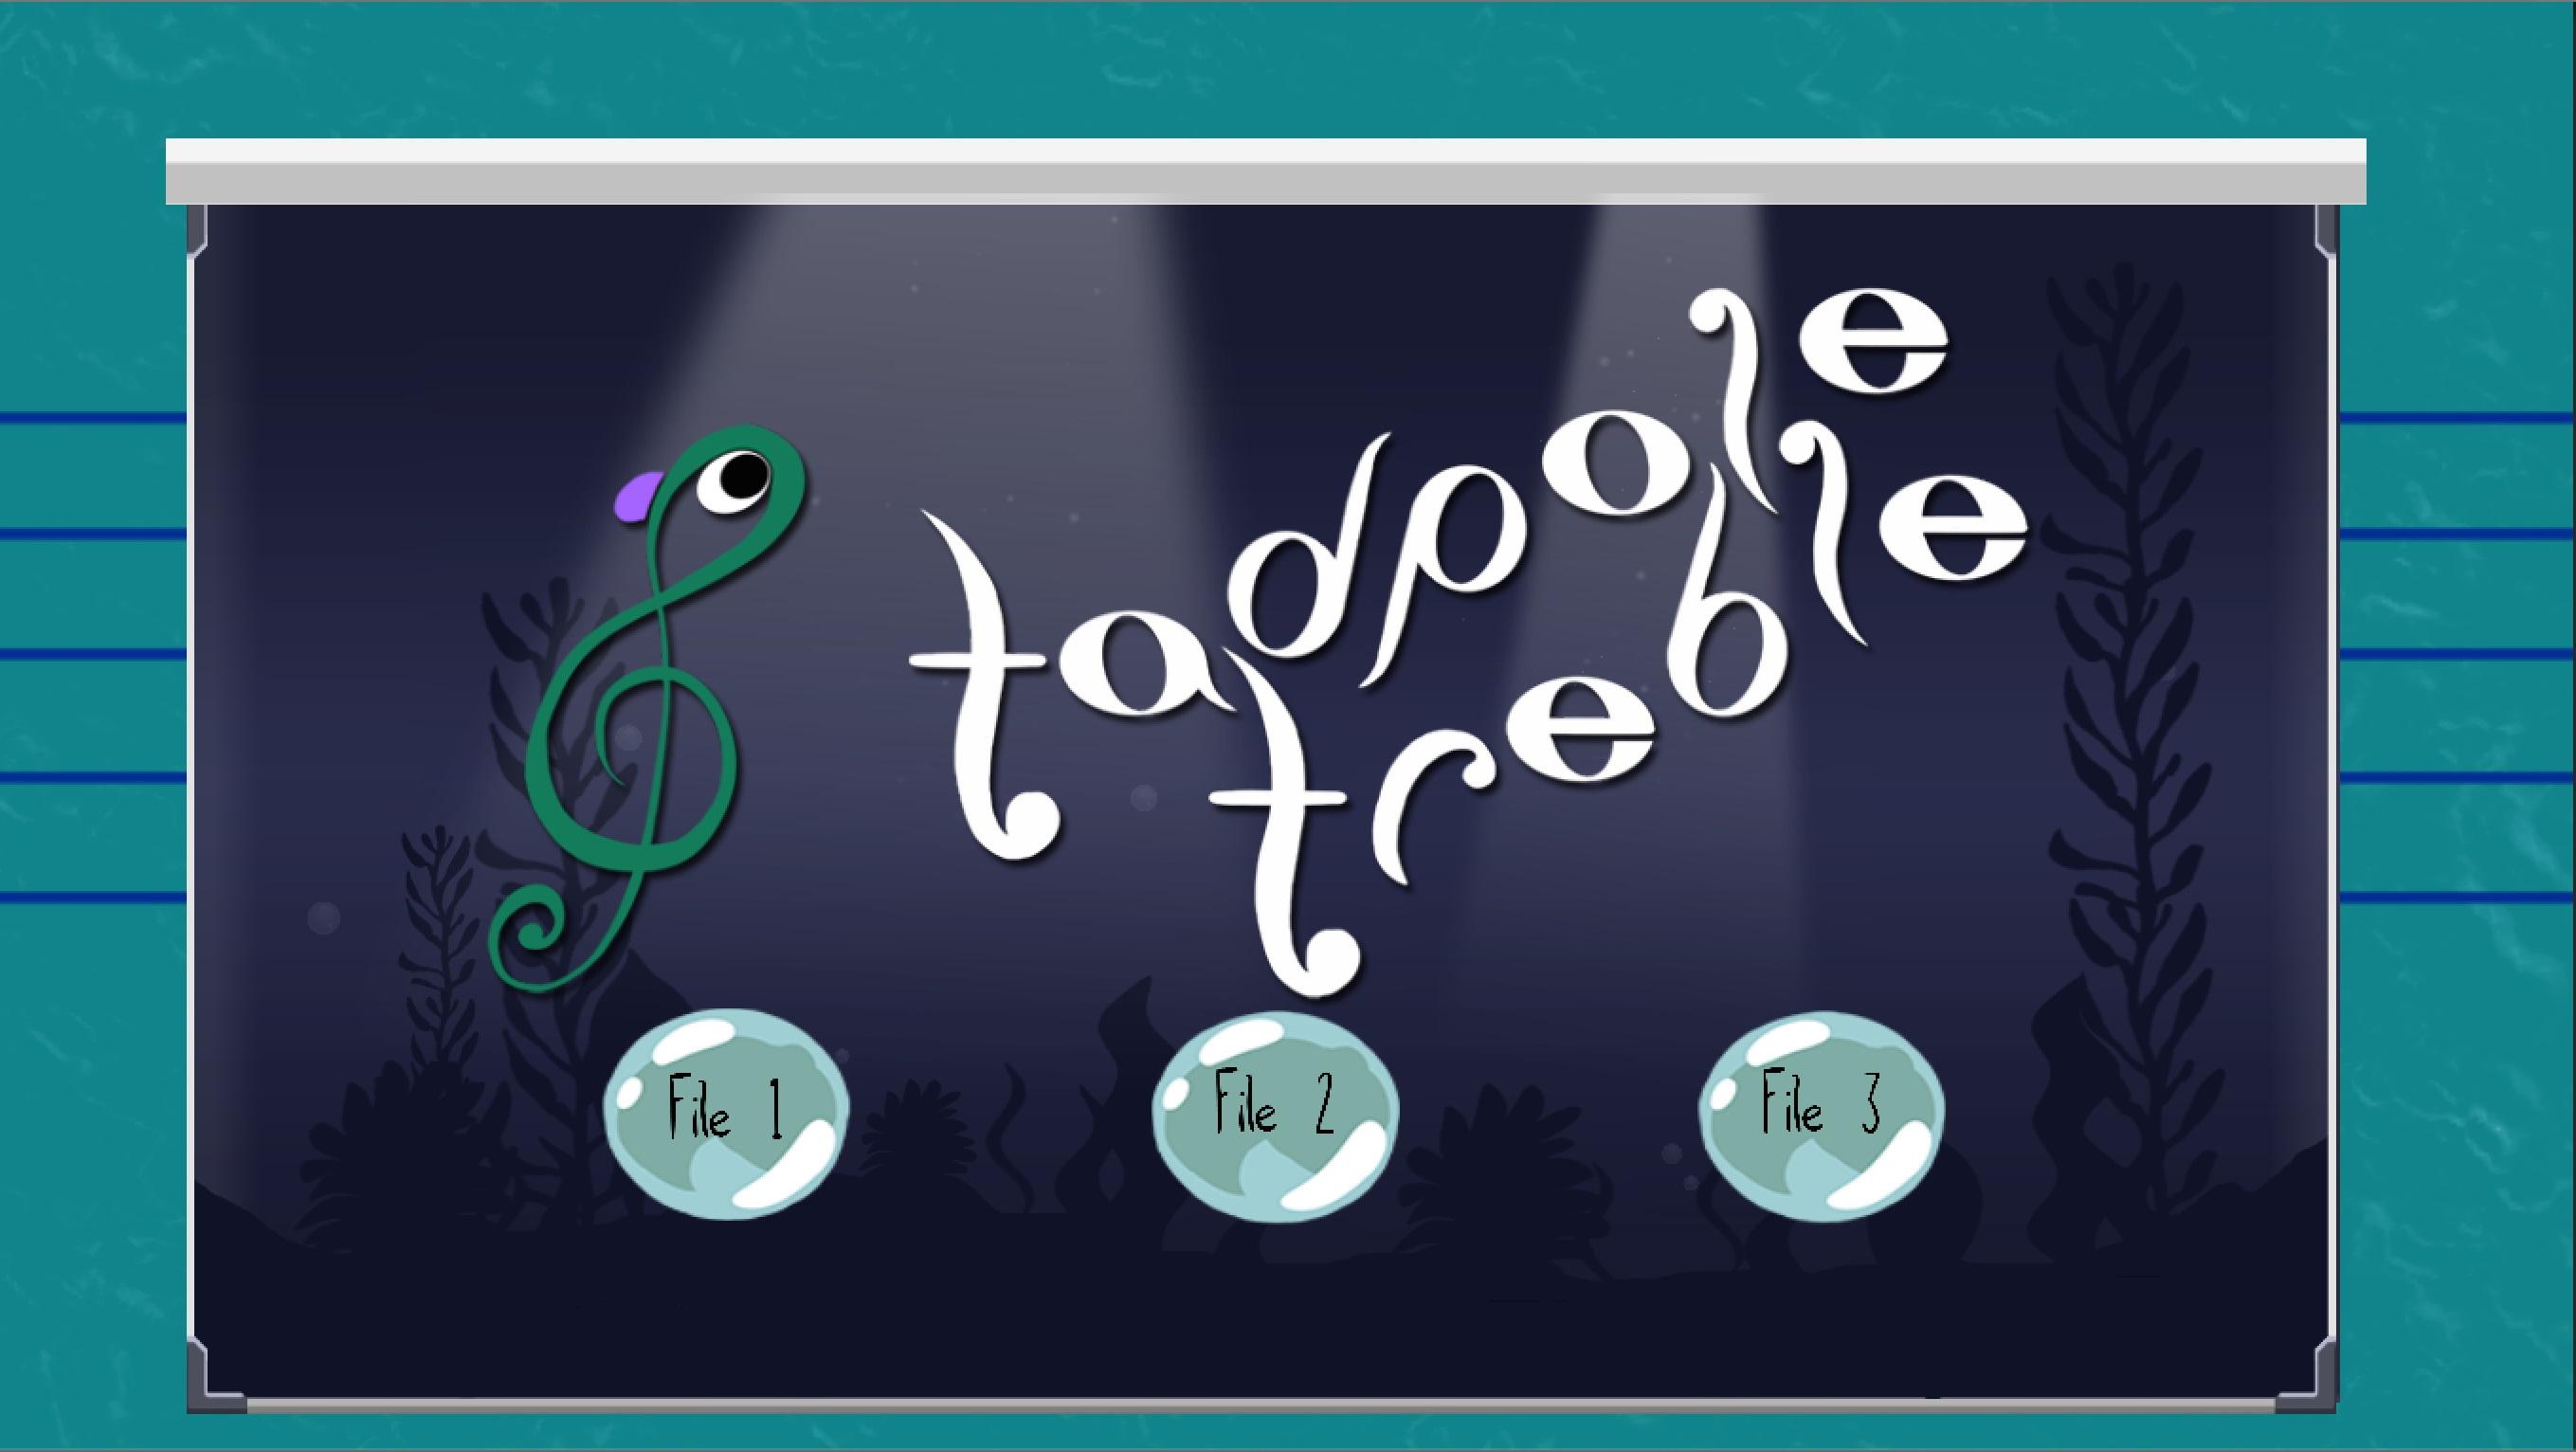 tadpole-treble